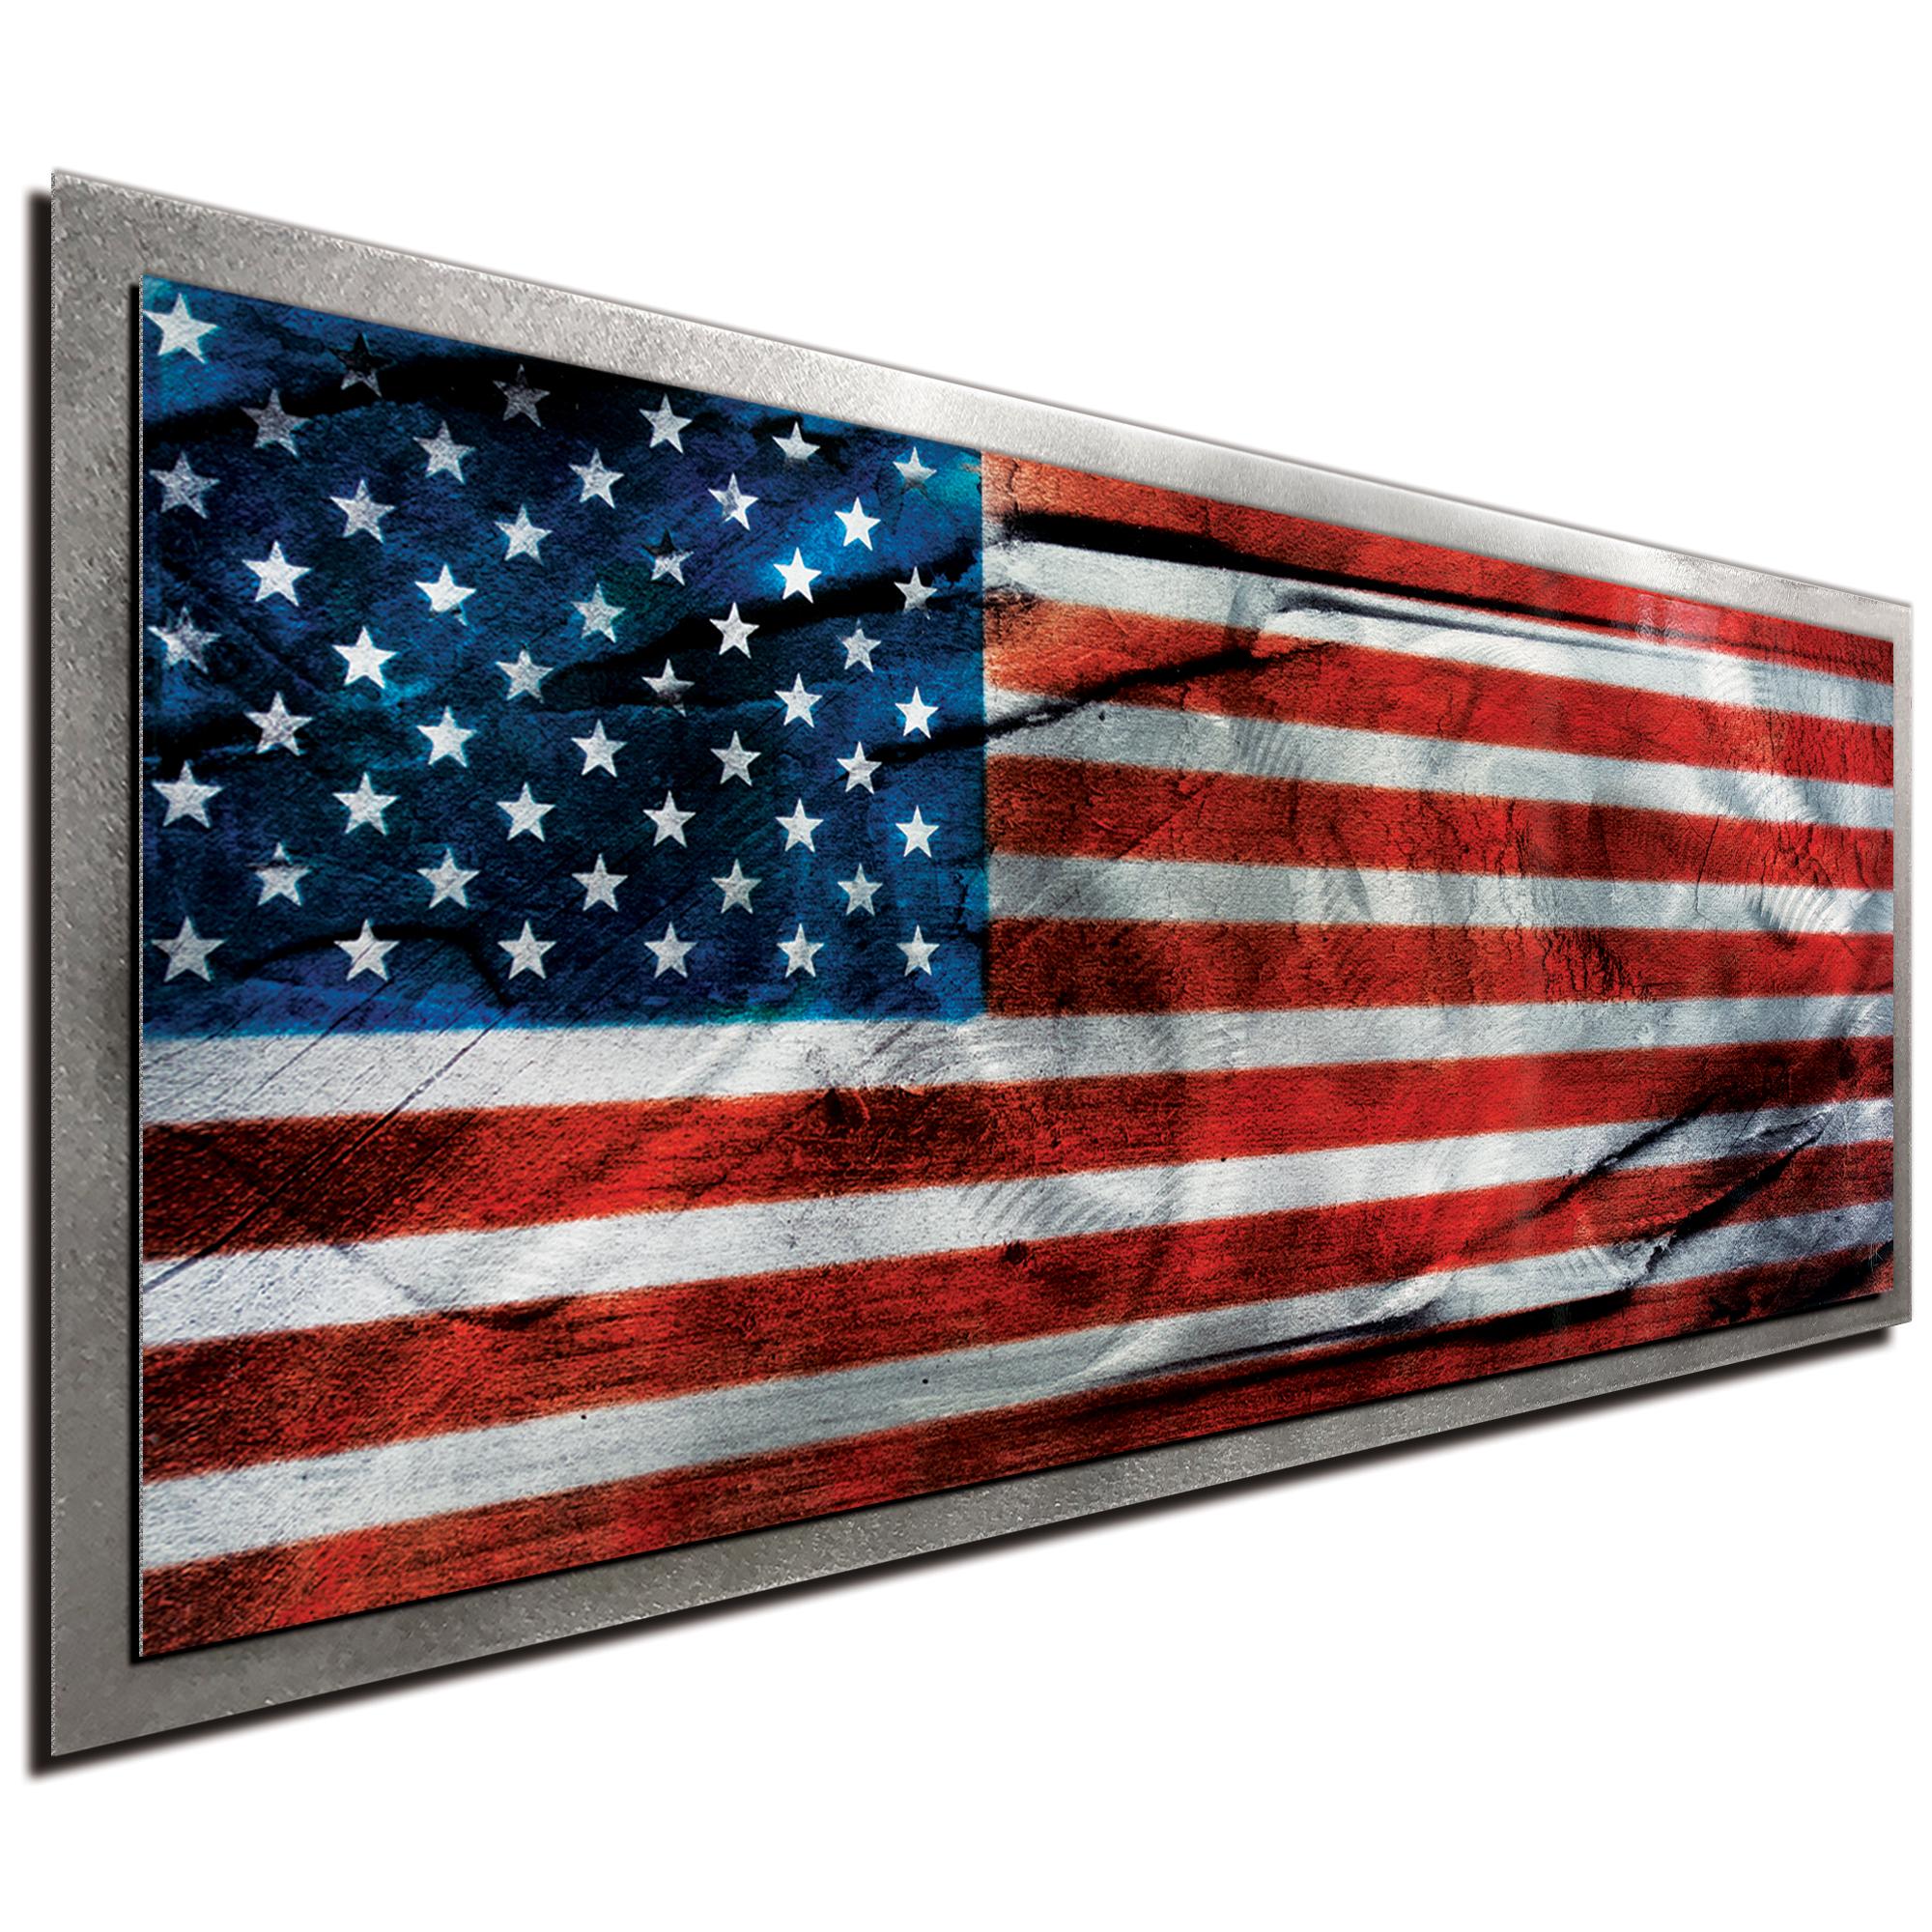 American Glory Framed - Image 2